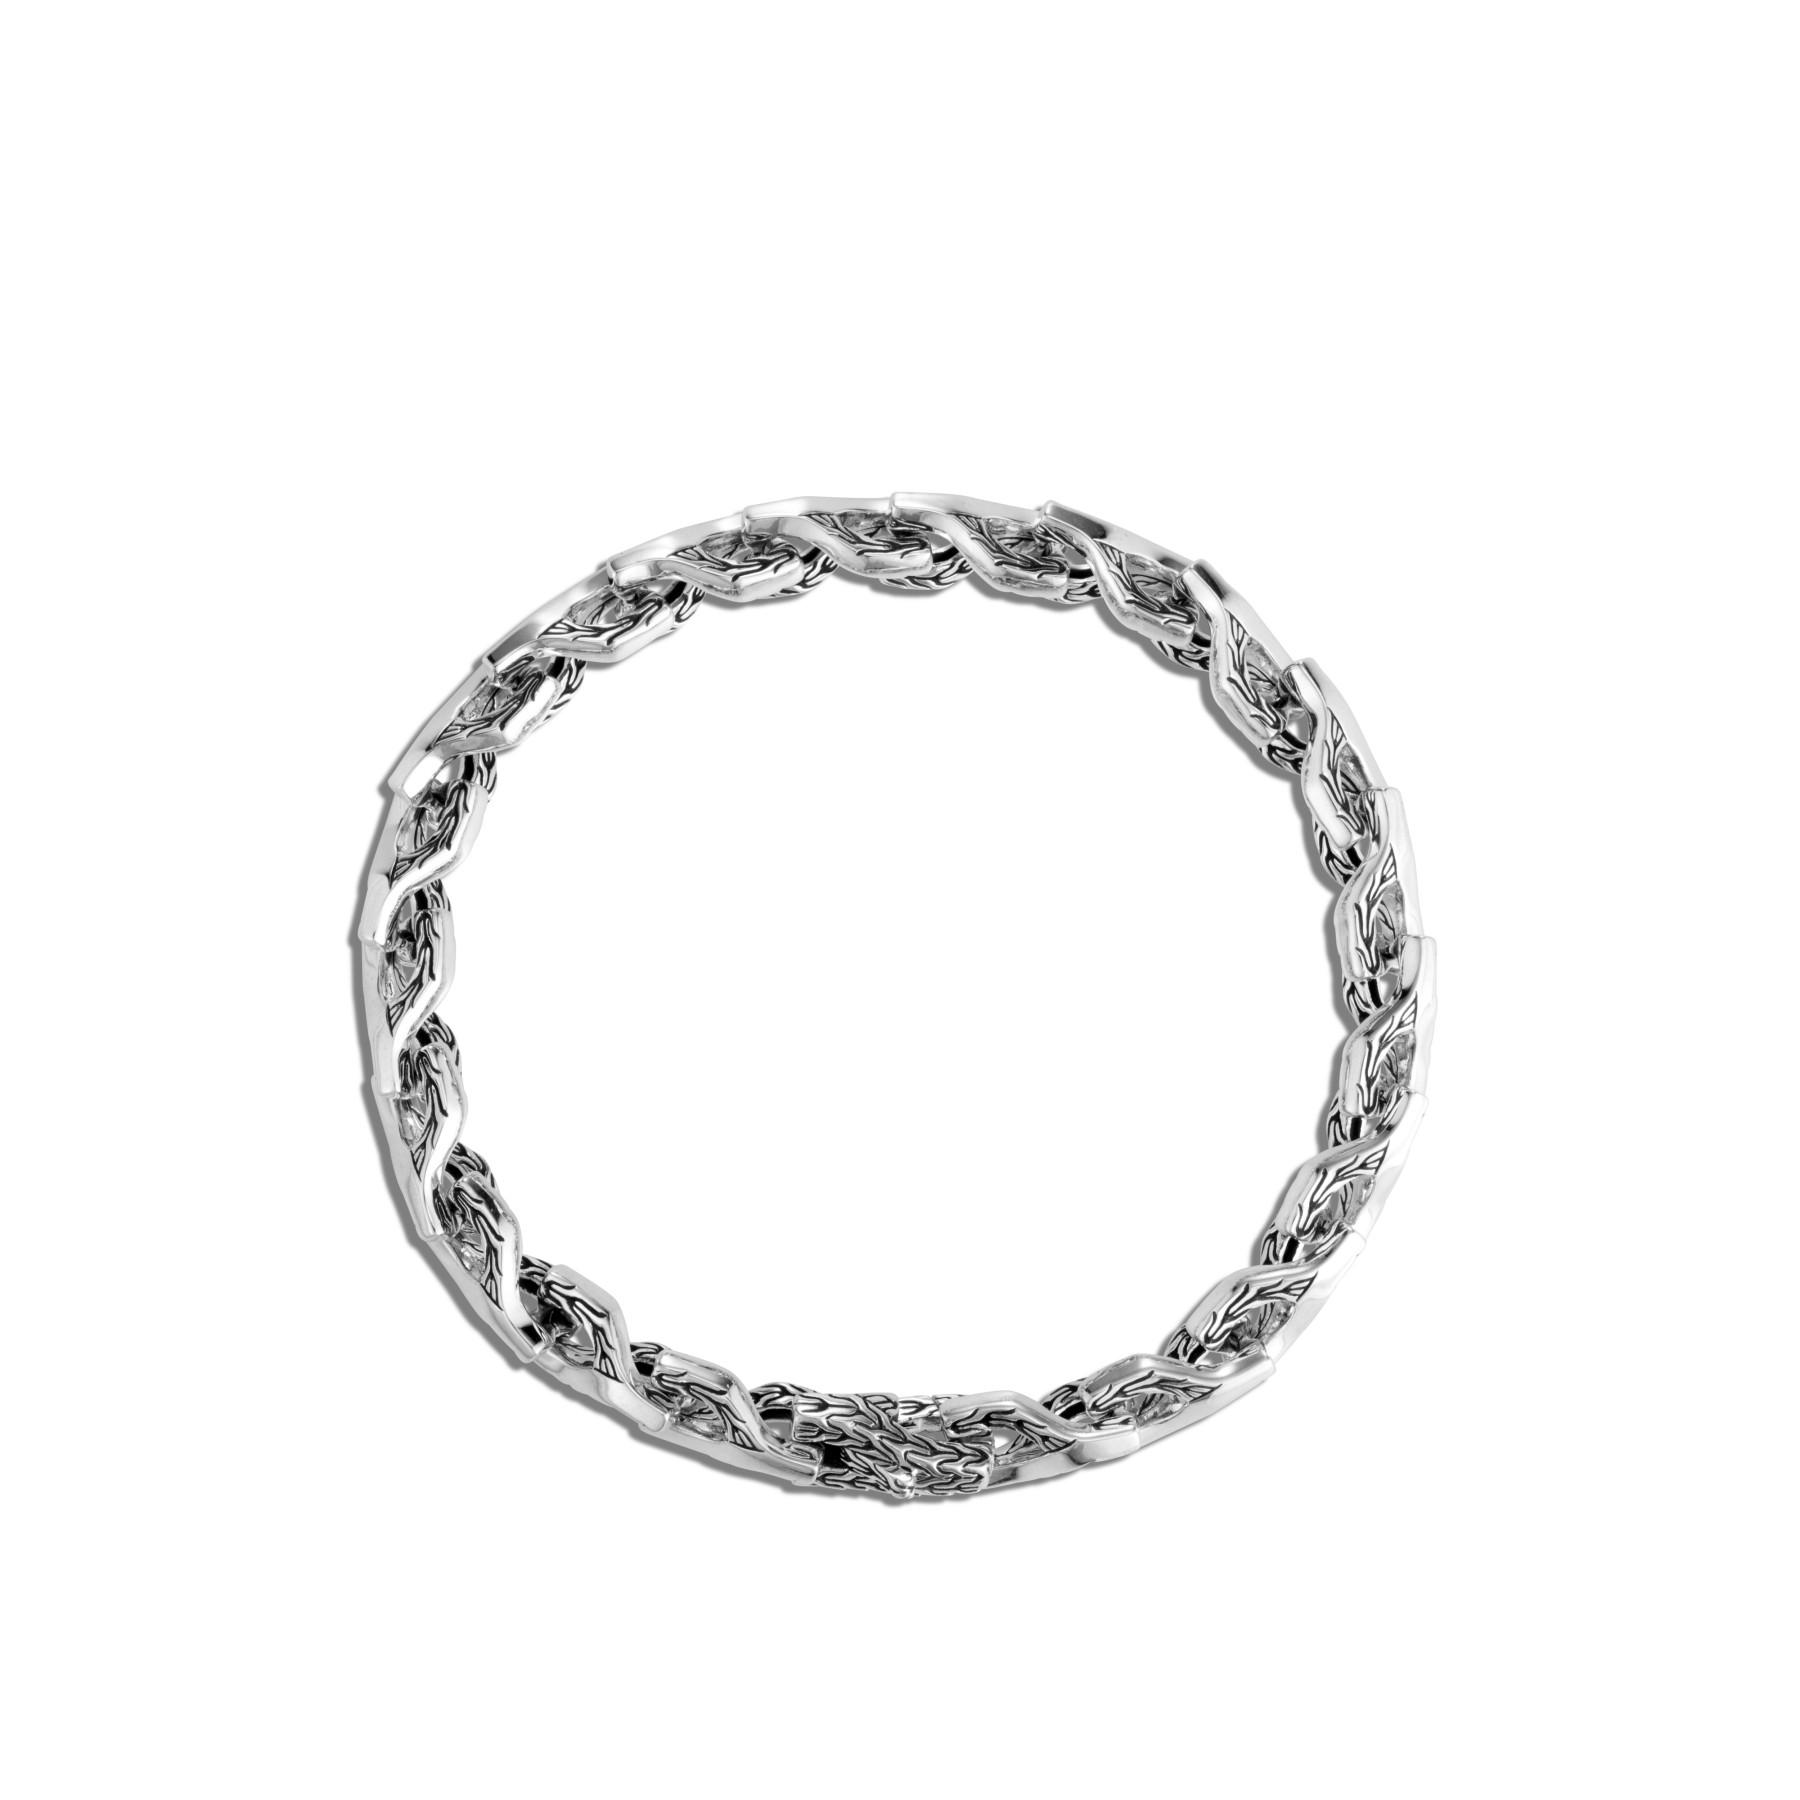 John Hardy Asli Classic Chain Silver Link Bracelet - 7mm top view